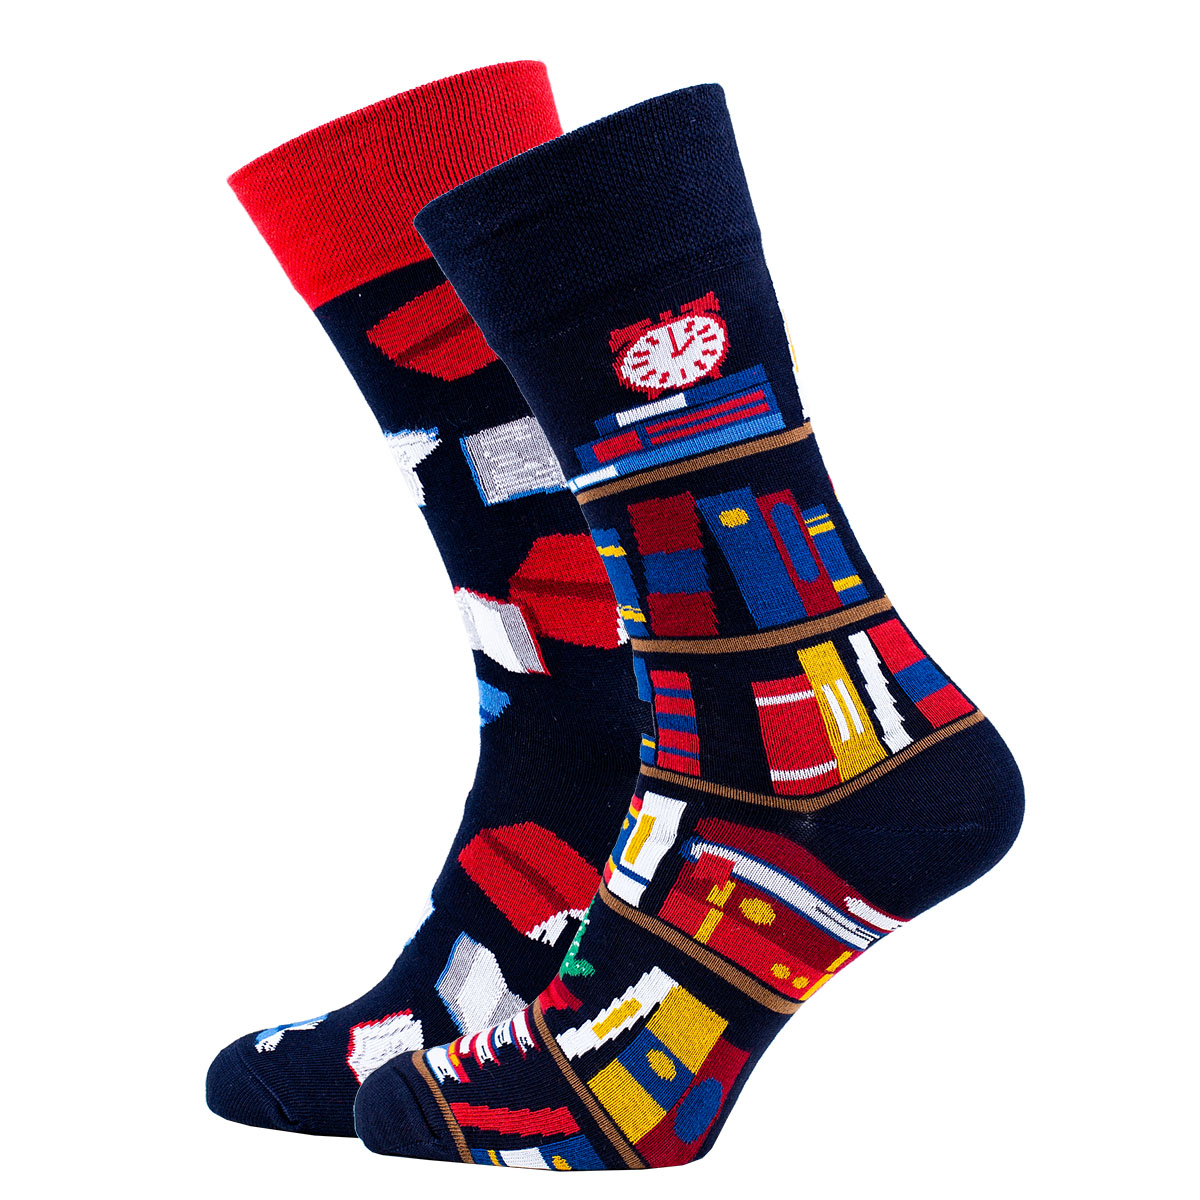 Veselé vzorované ponožky The Book Story tmavě modré vel. 35-38